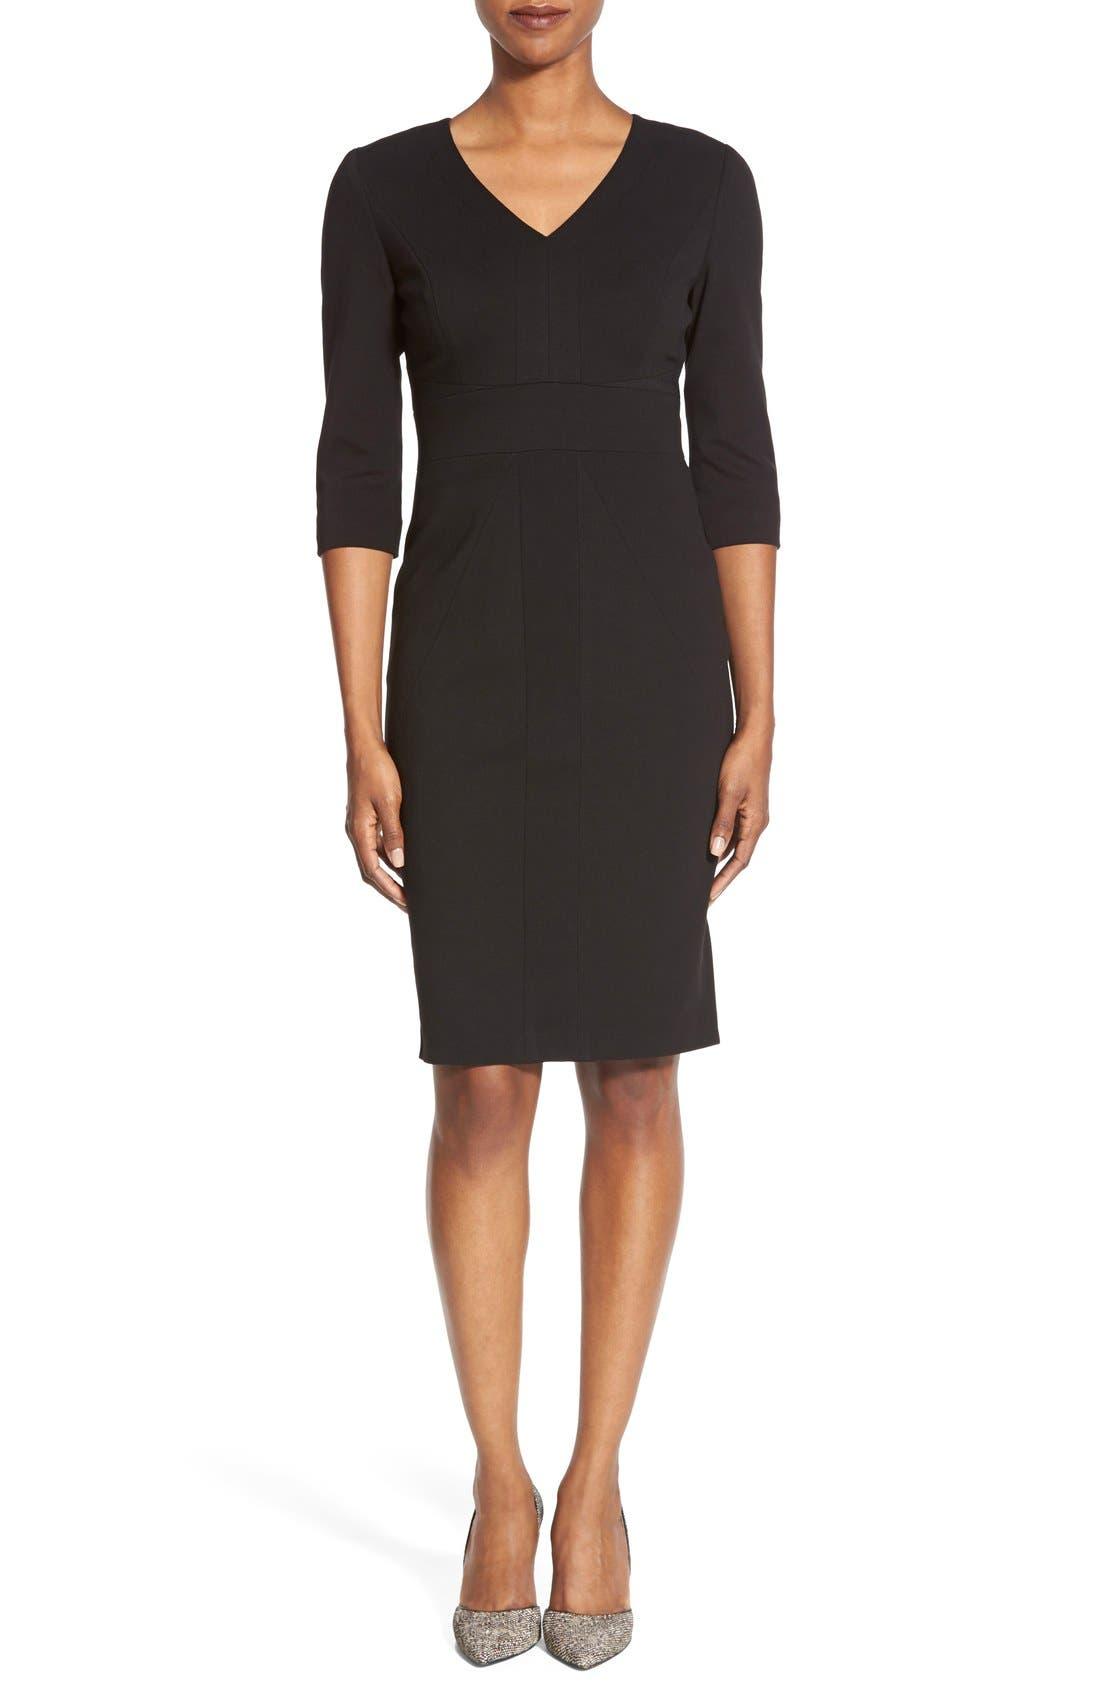 Alternate Image 1 Selected - Classiques Entier® V-Neck Ponte Sheath Dress (Regular & Petite)